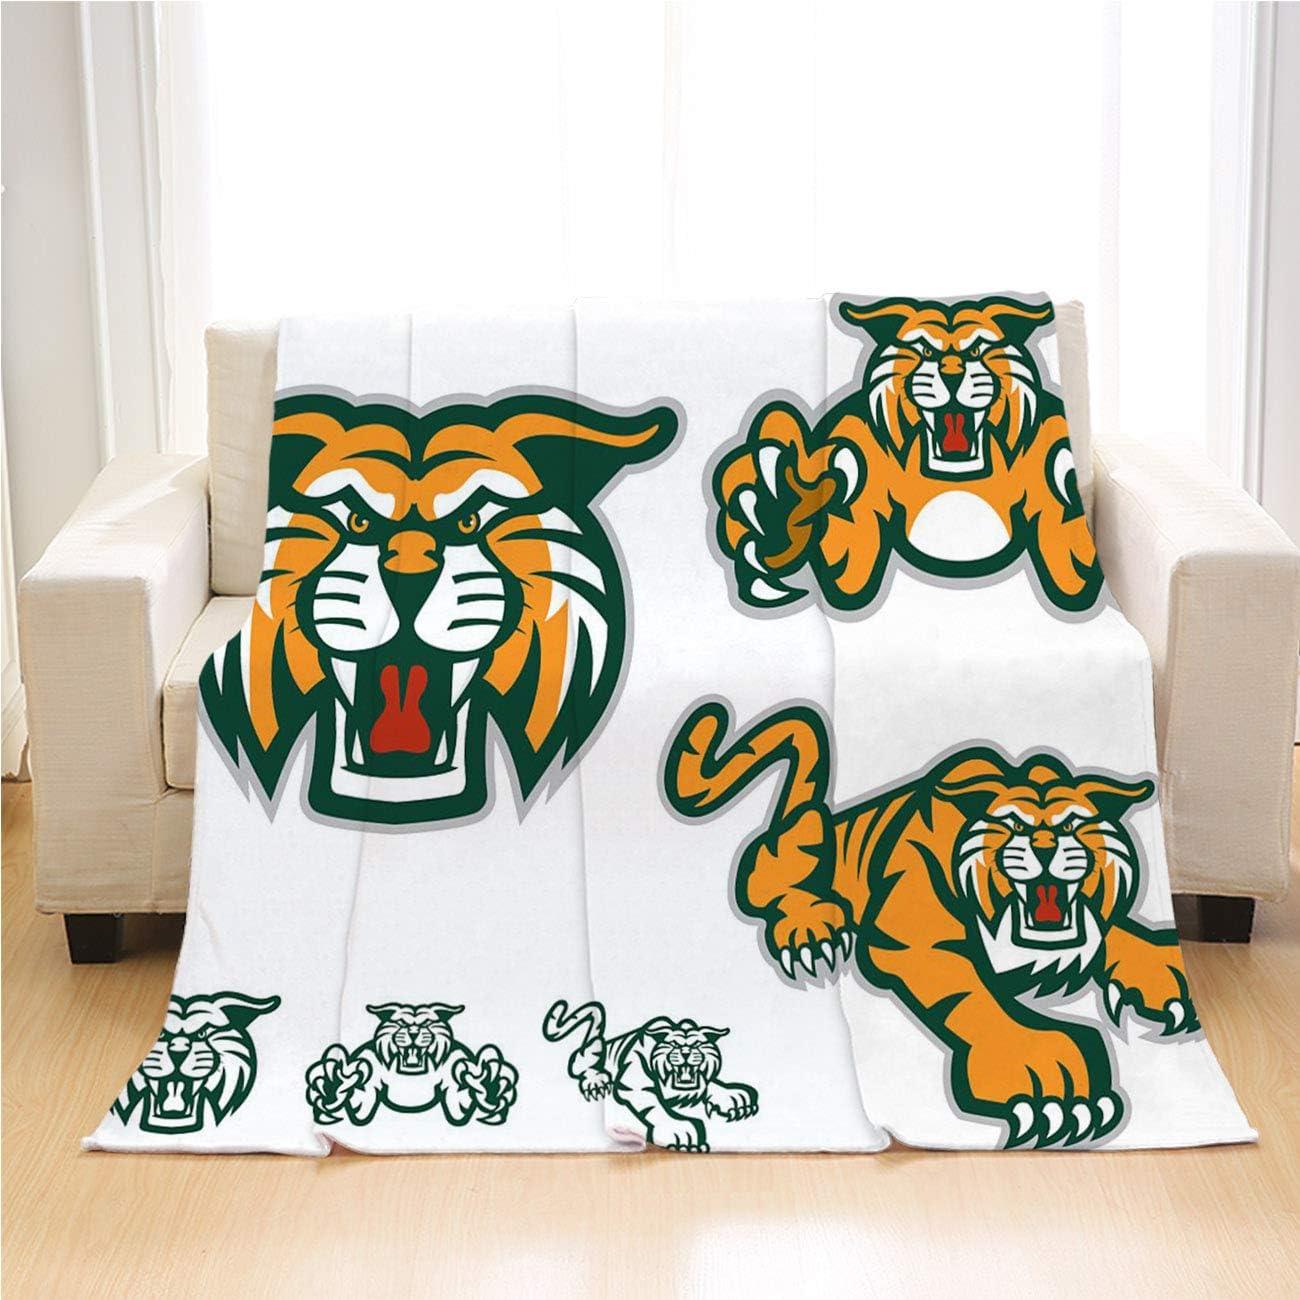 Tiger 日本 Blanket Luxury 本物◆ Super Soft A Versions Six Throw of